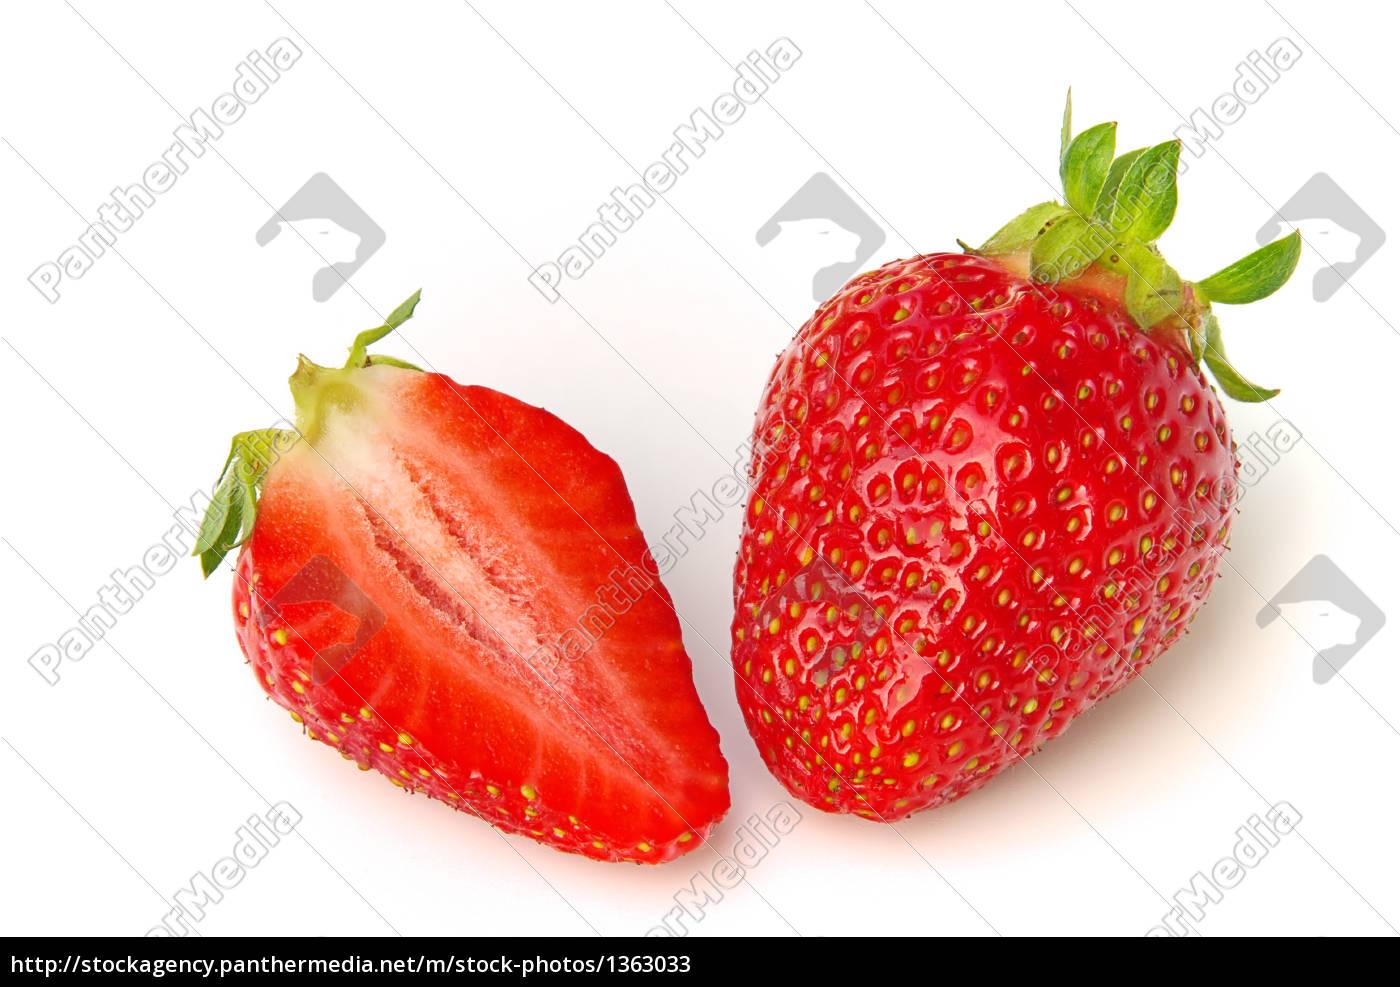 strawberry, 05 - 1363033